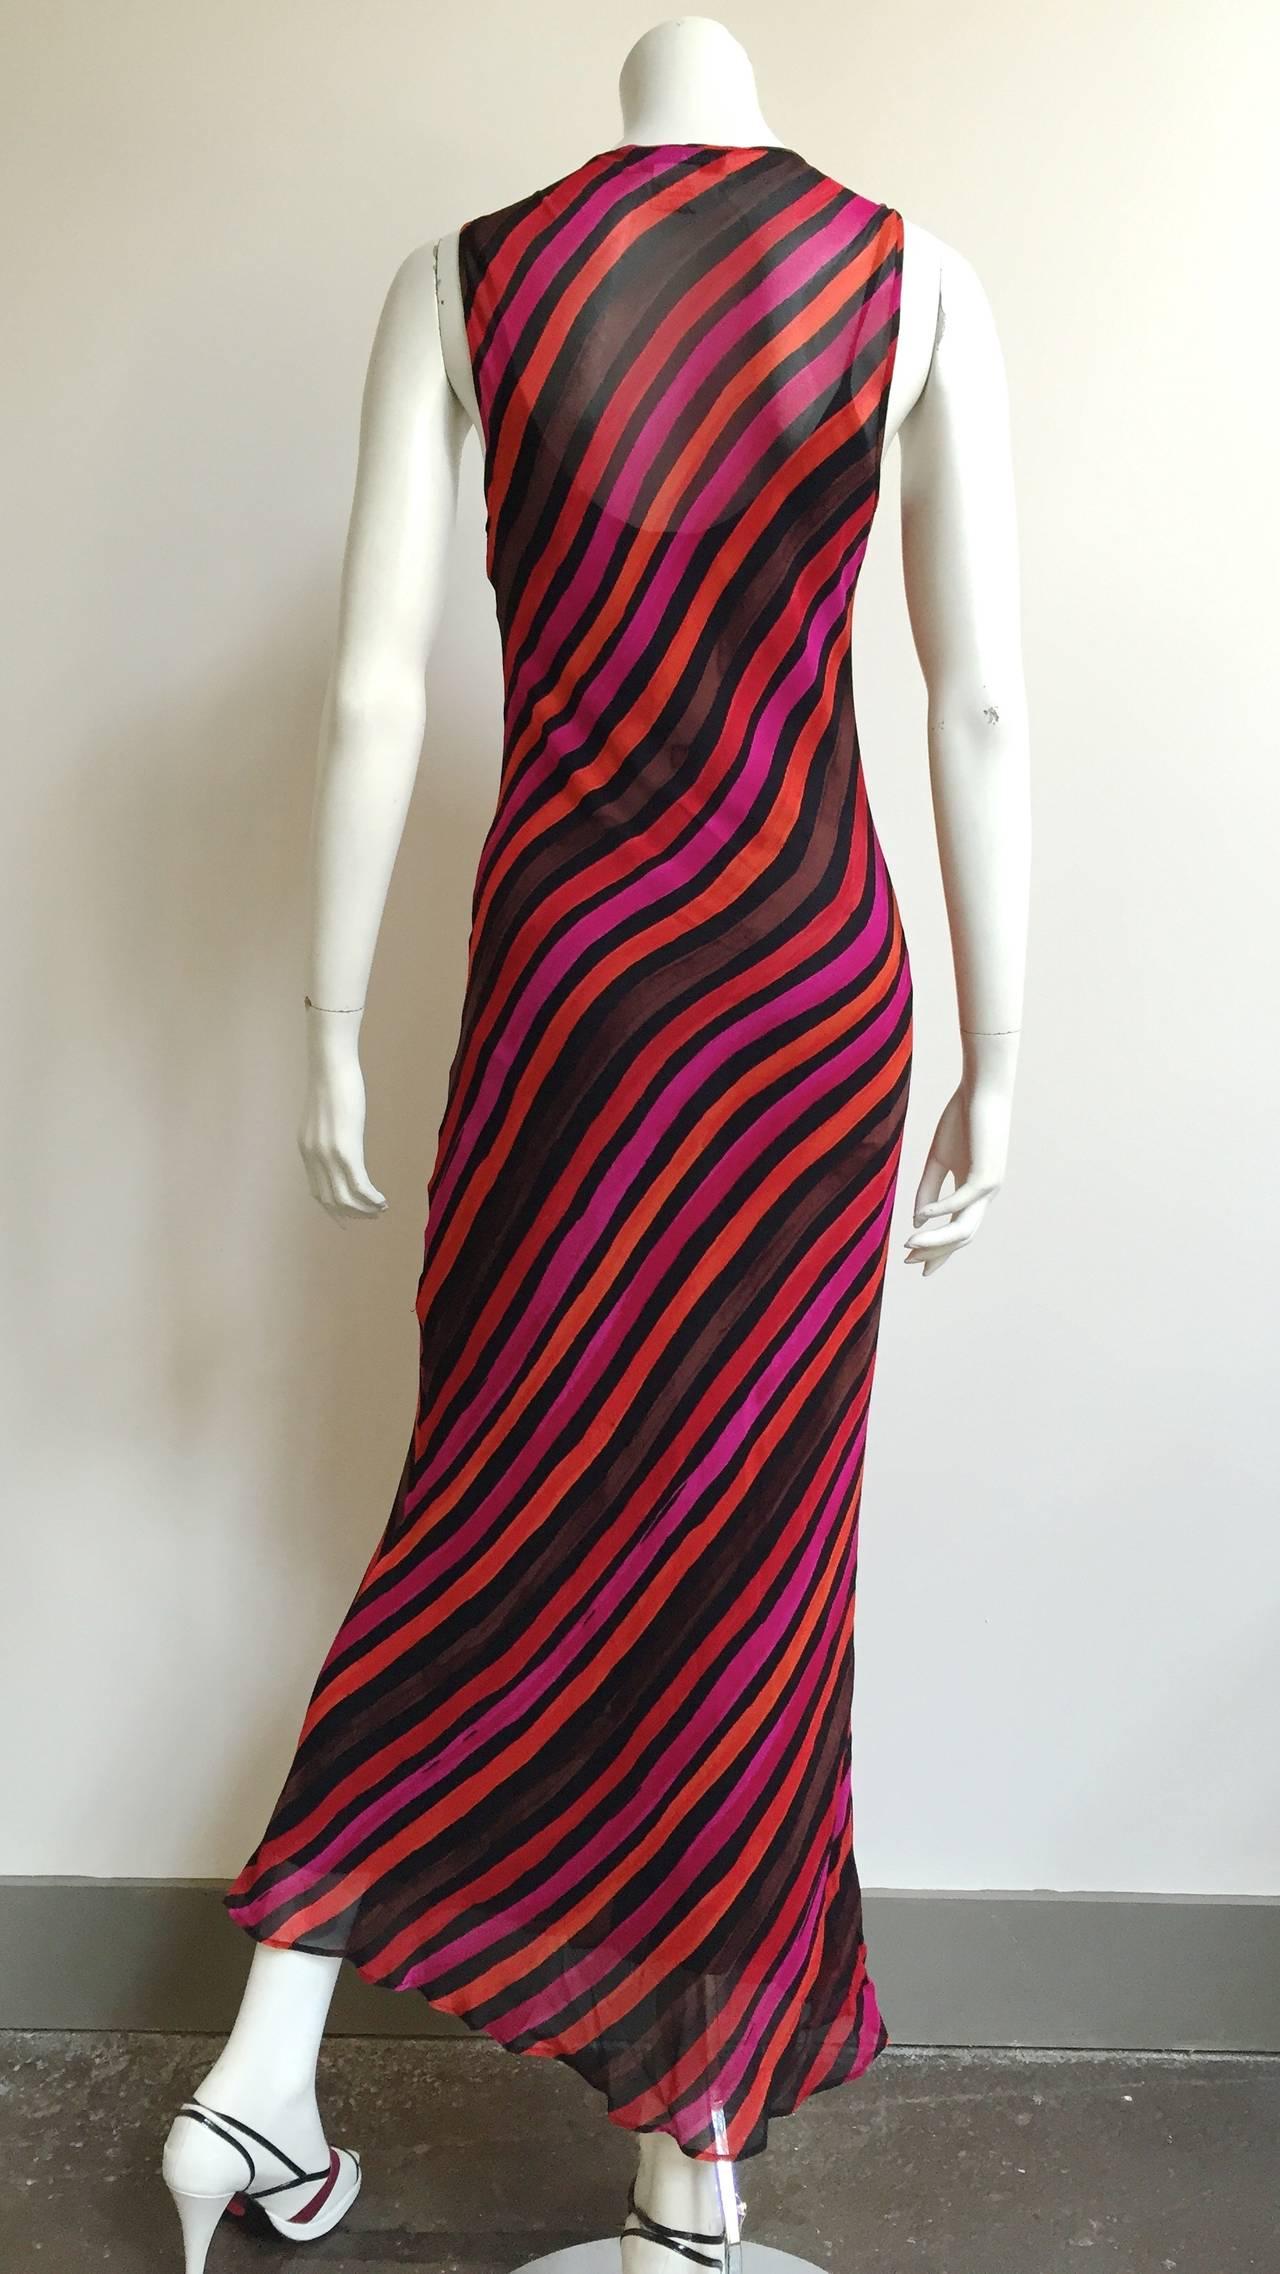 Sonia Rykiel  Striped Dress Size 4 / 6. In Good Condition For Sale In Atlanta, GA